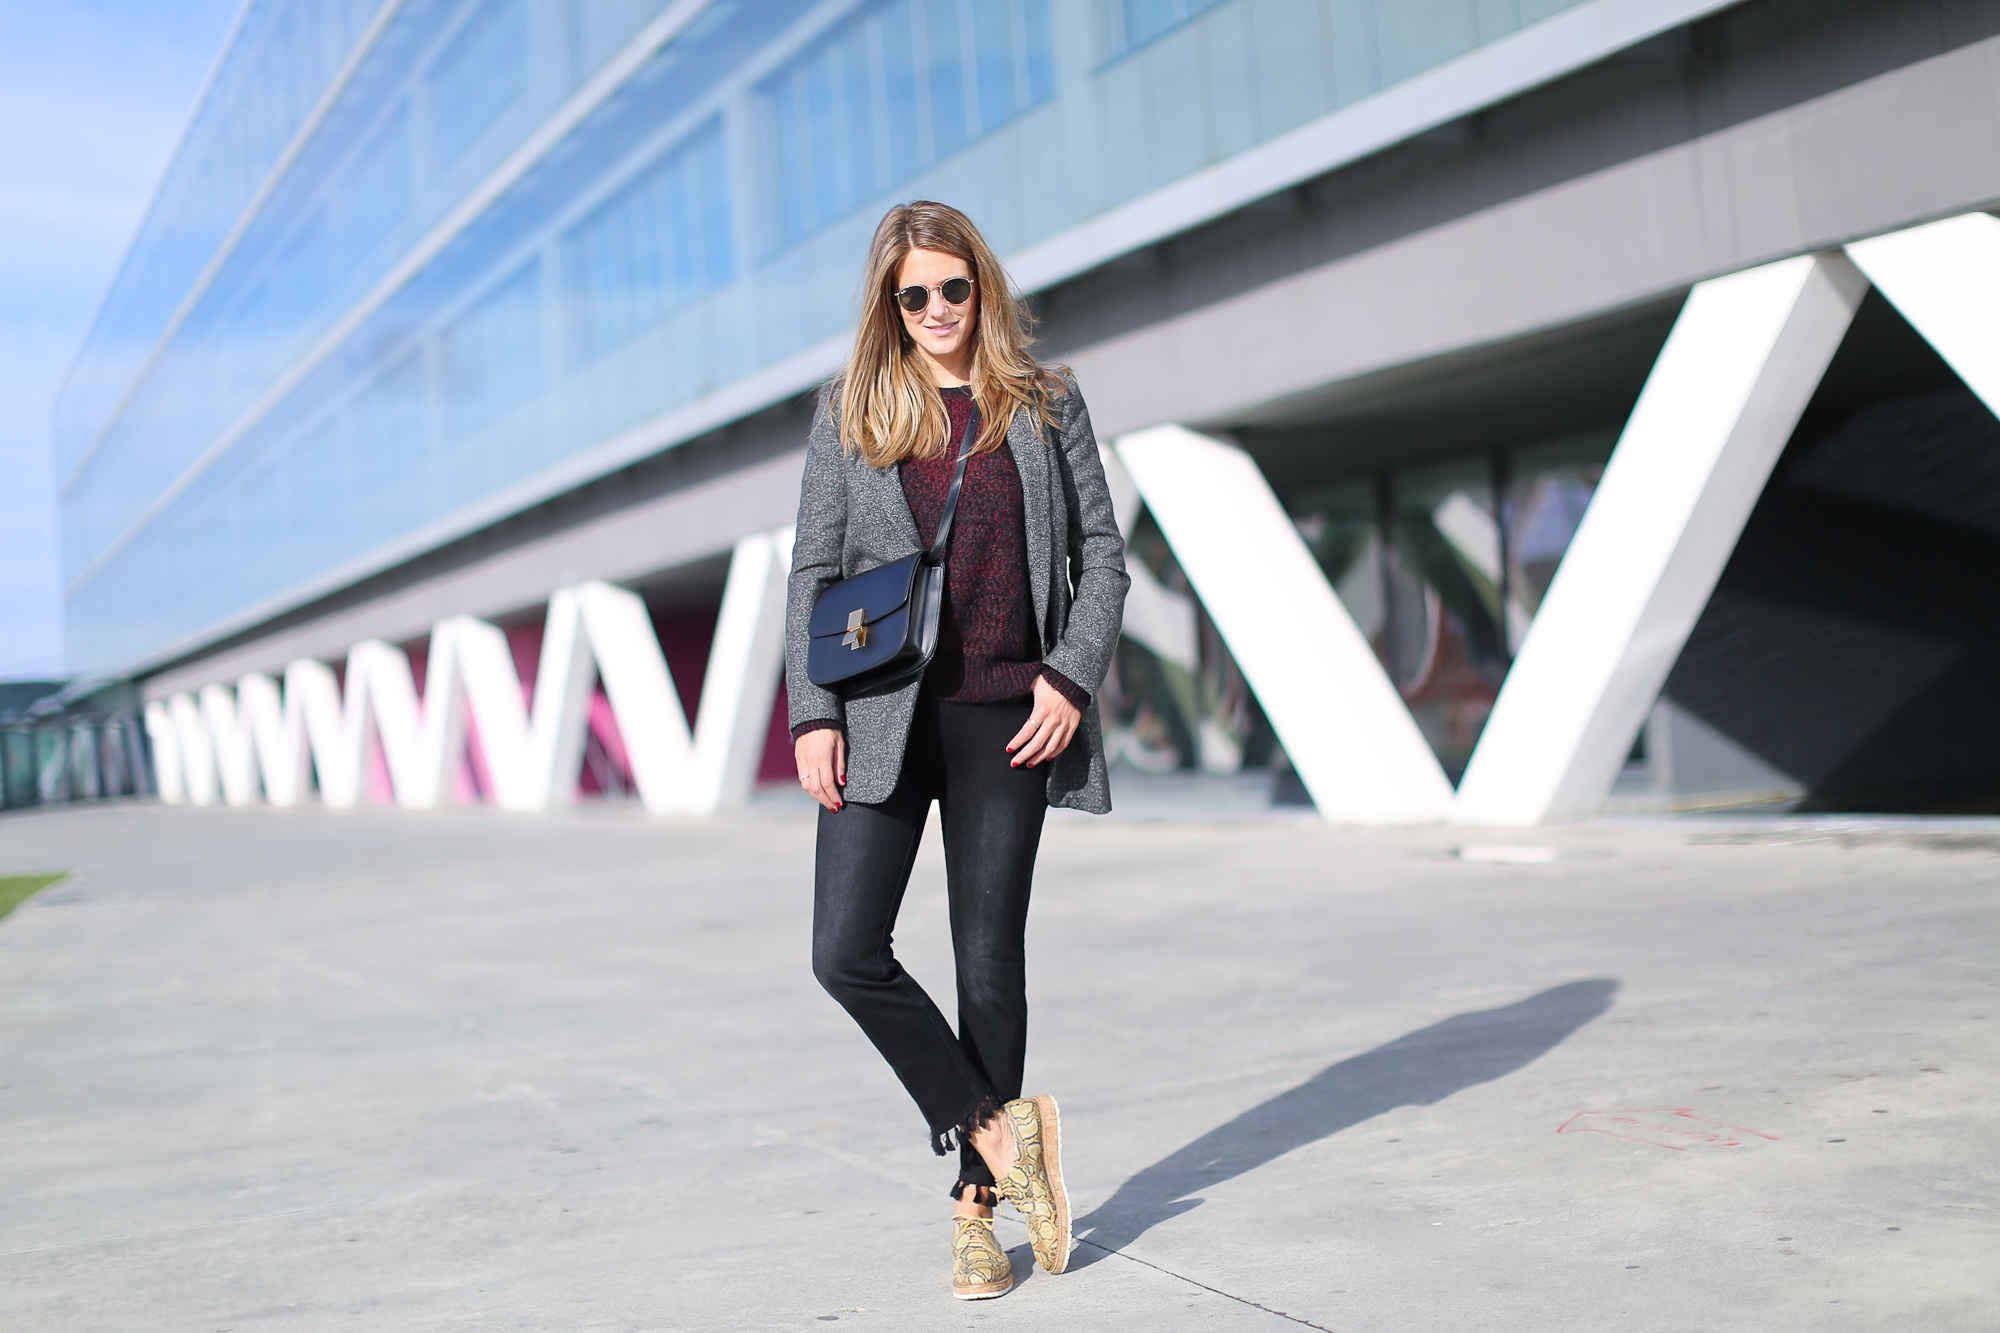 Clochet_streetstyle_fashionblogger_bilbao_zapatospielpertiniestampadoserpientepiton_zarajeansborlaspompones-3